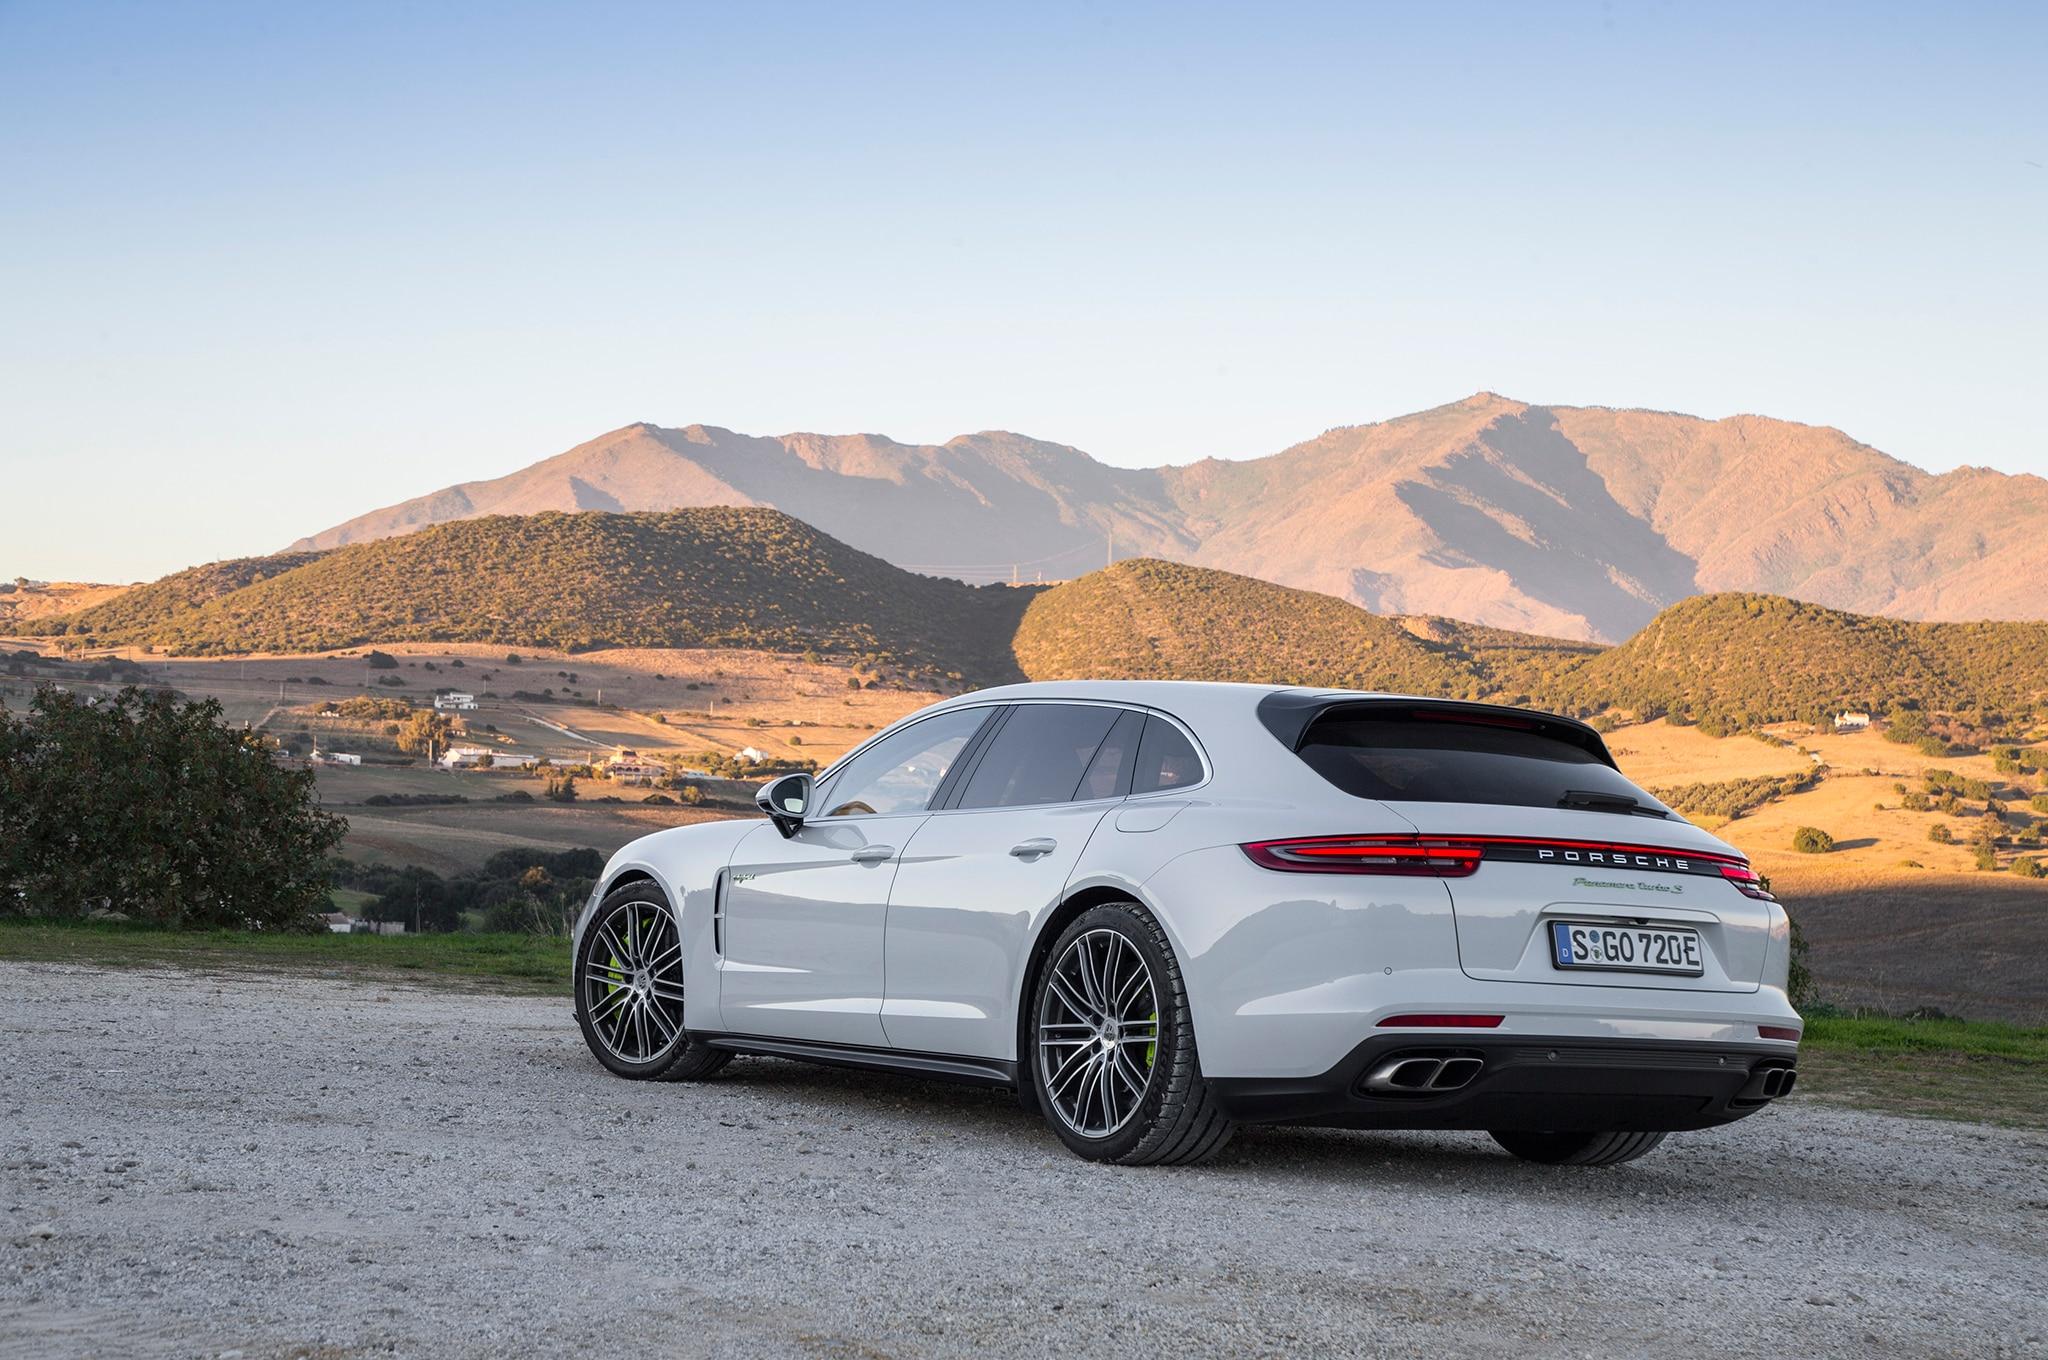 2018 Porsche Panamera Turbo S E Hybrid Sport Turismo First